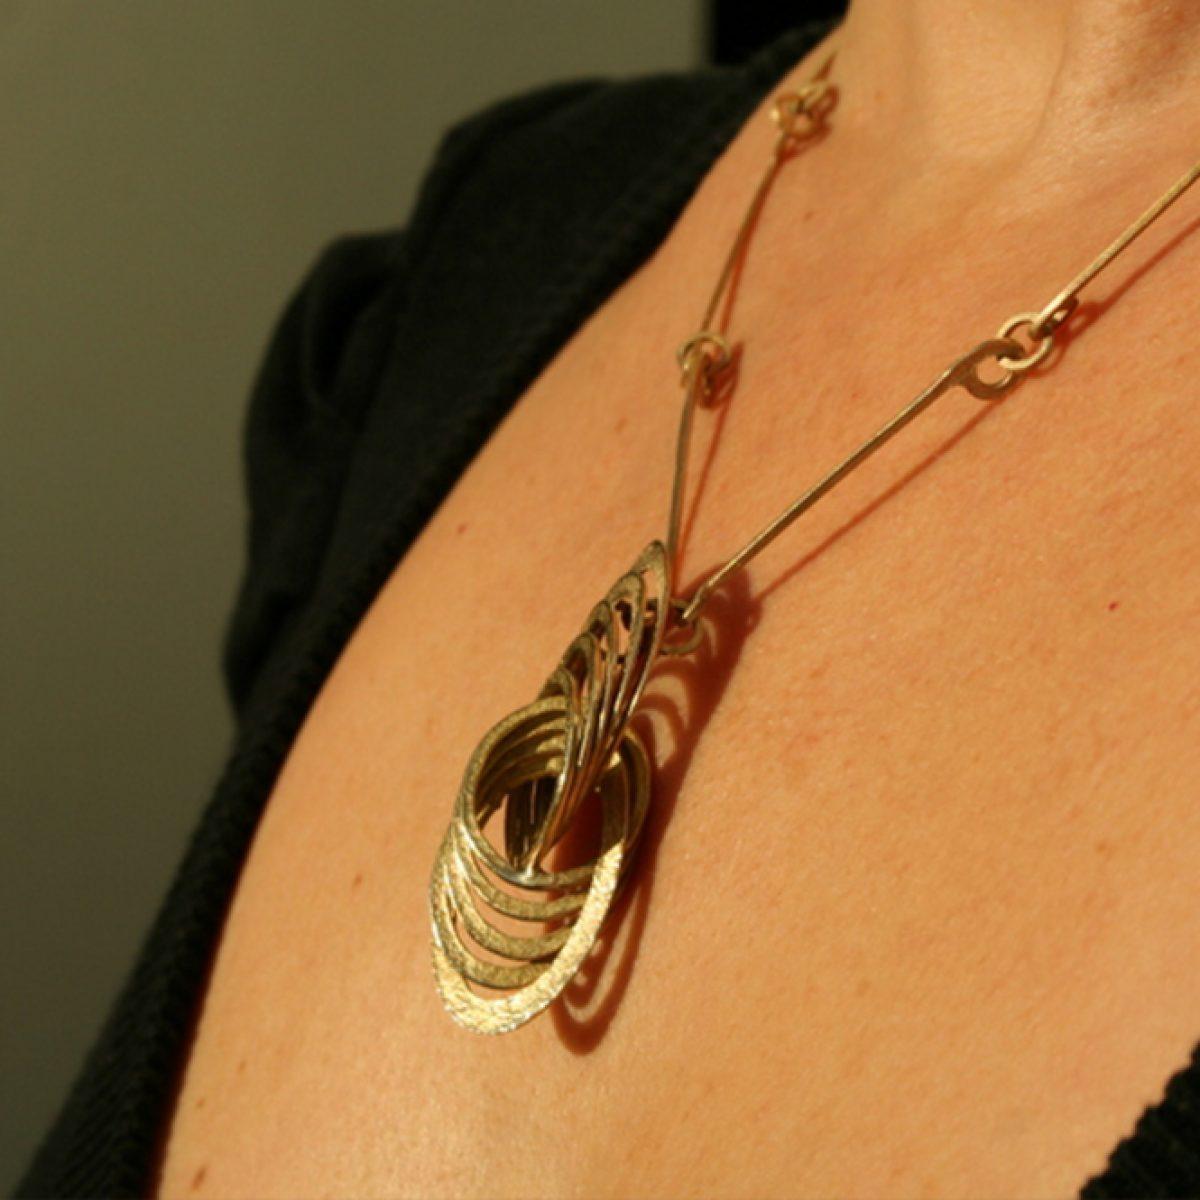 Halsjuwelen